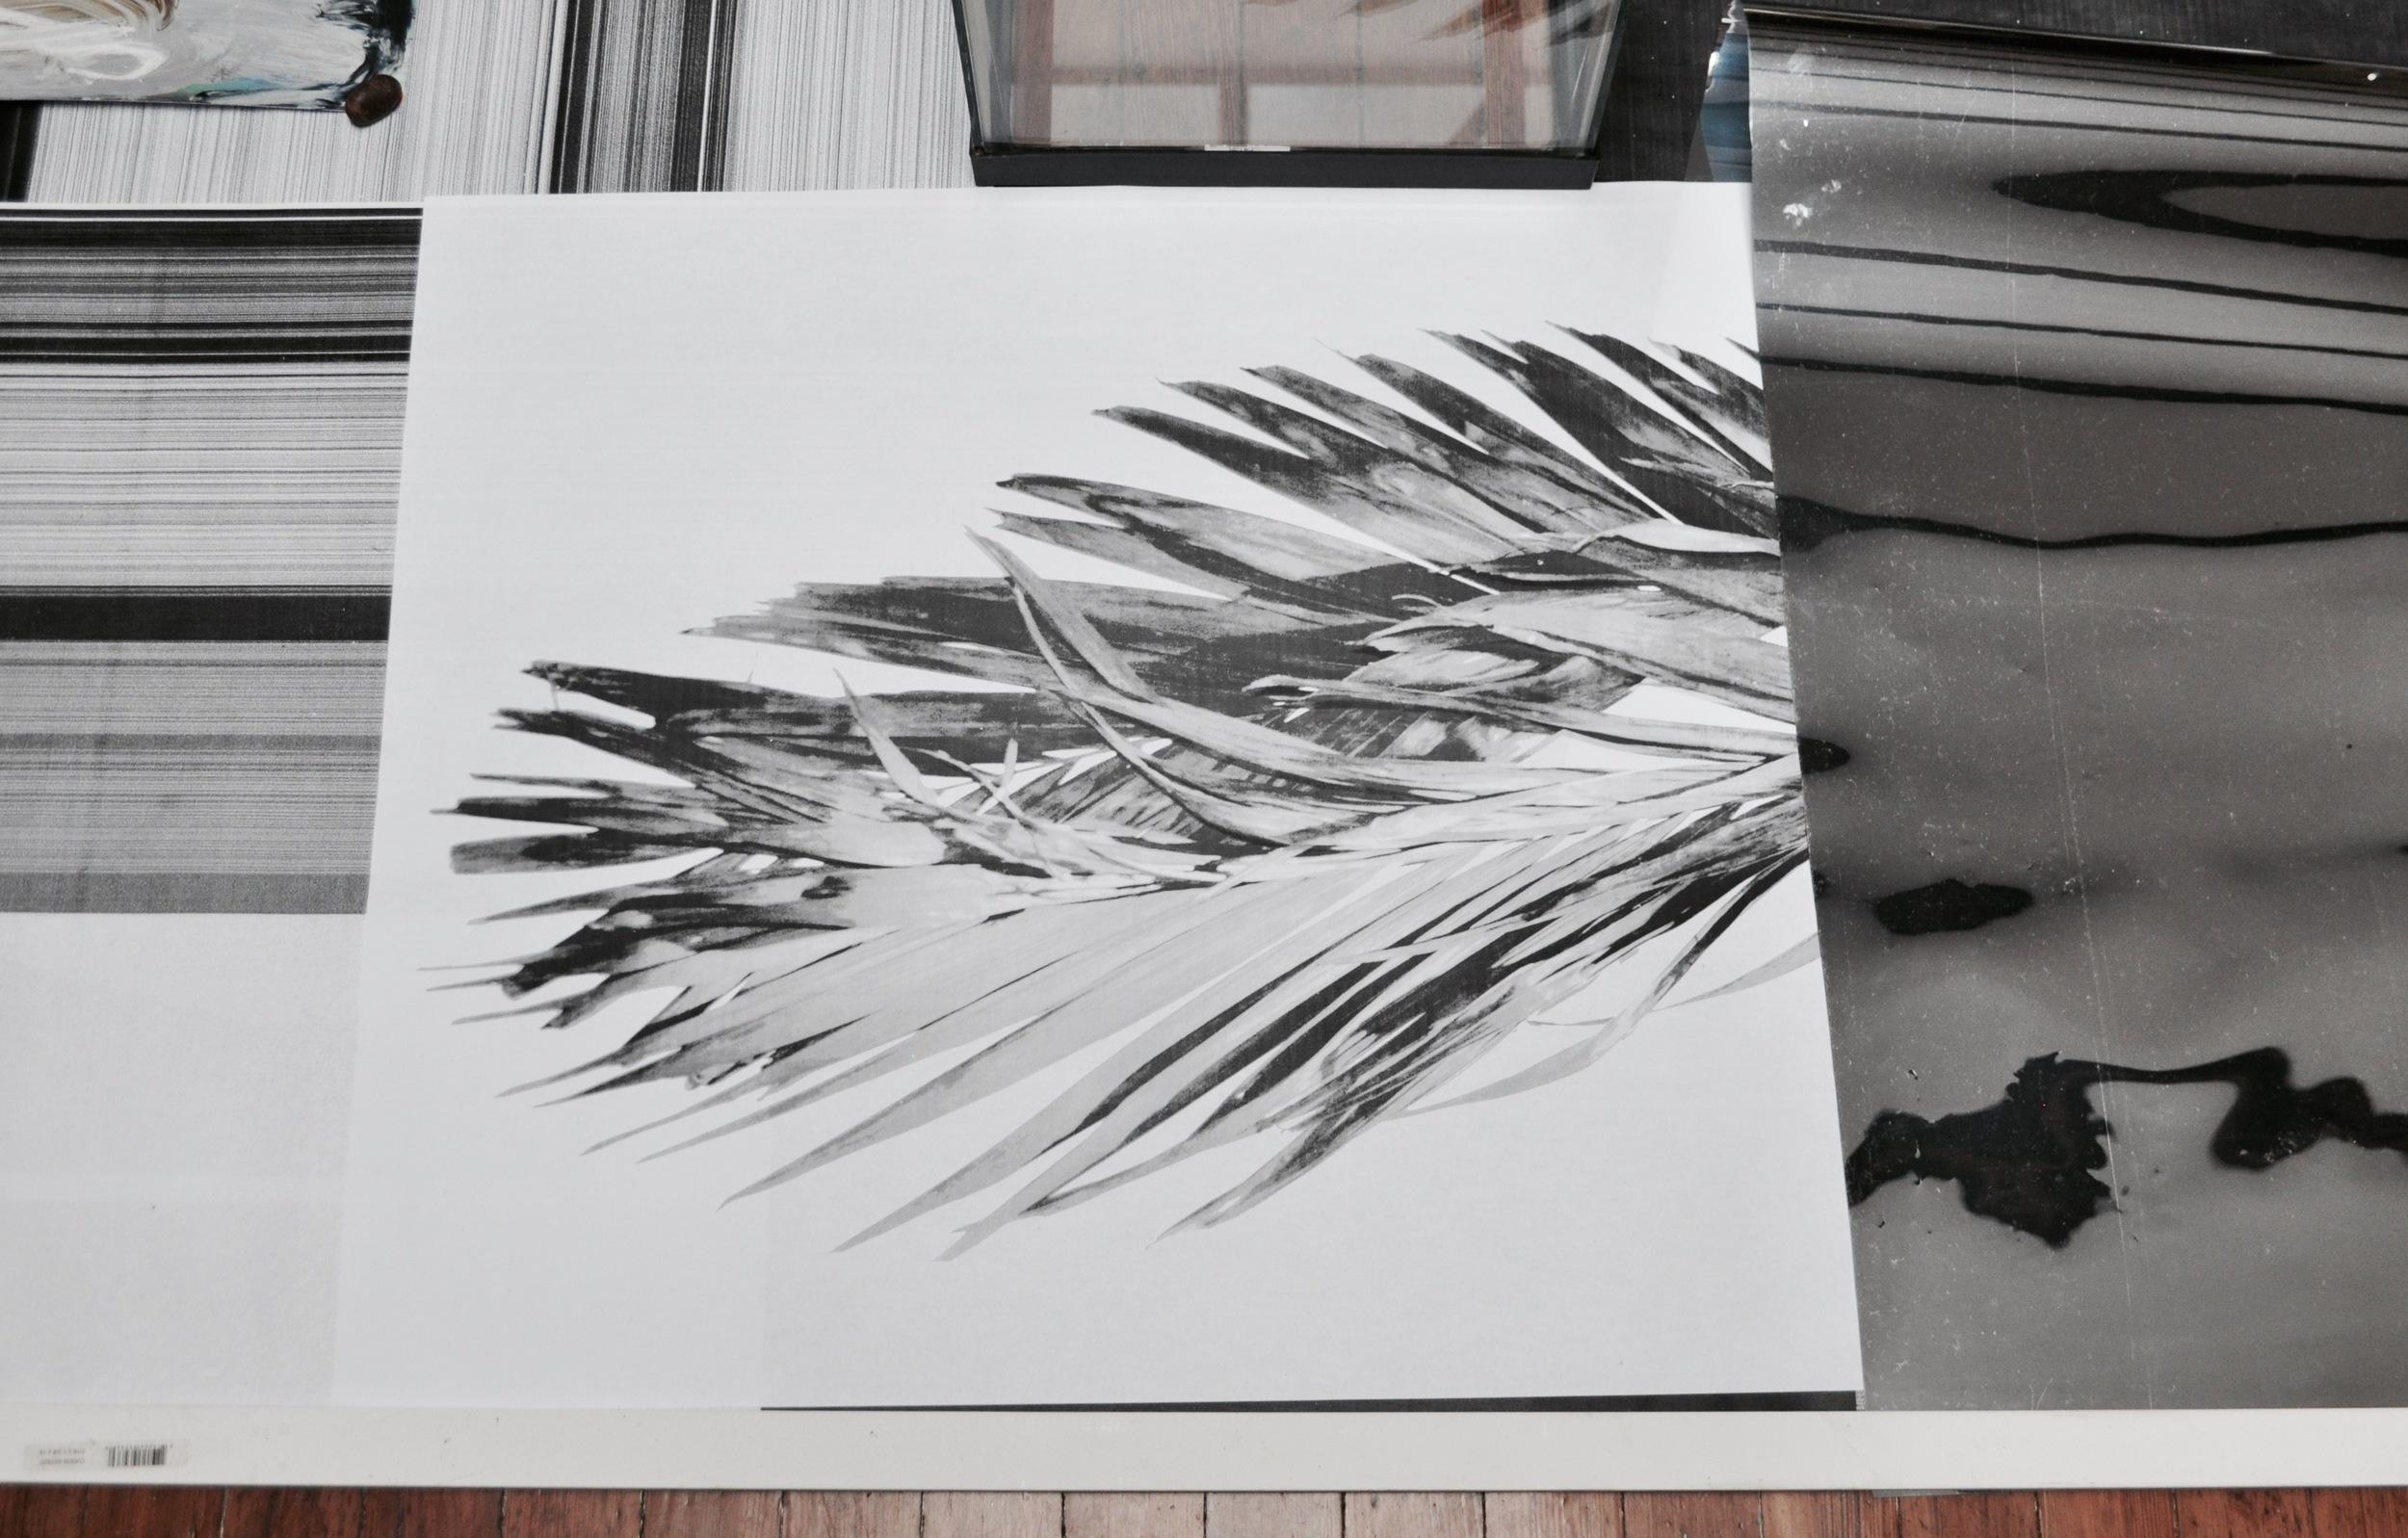 Home Grown Garden , 2016 wood, stones, c-prints, aquarium, mylar, oil on mirror paper 220 x 210 x 35 cm  (detail)